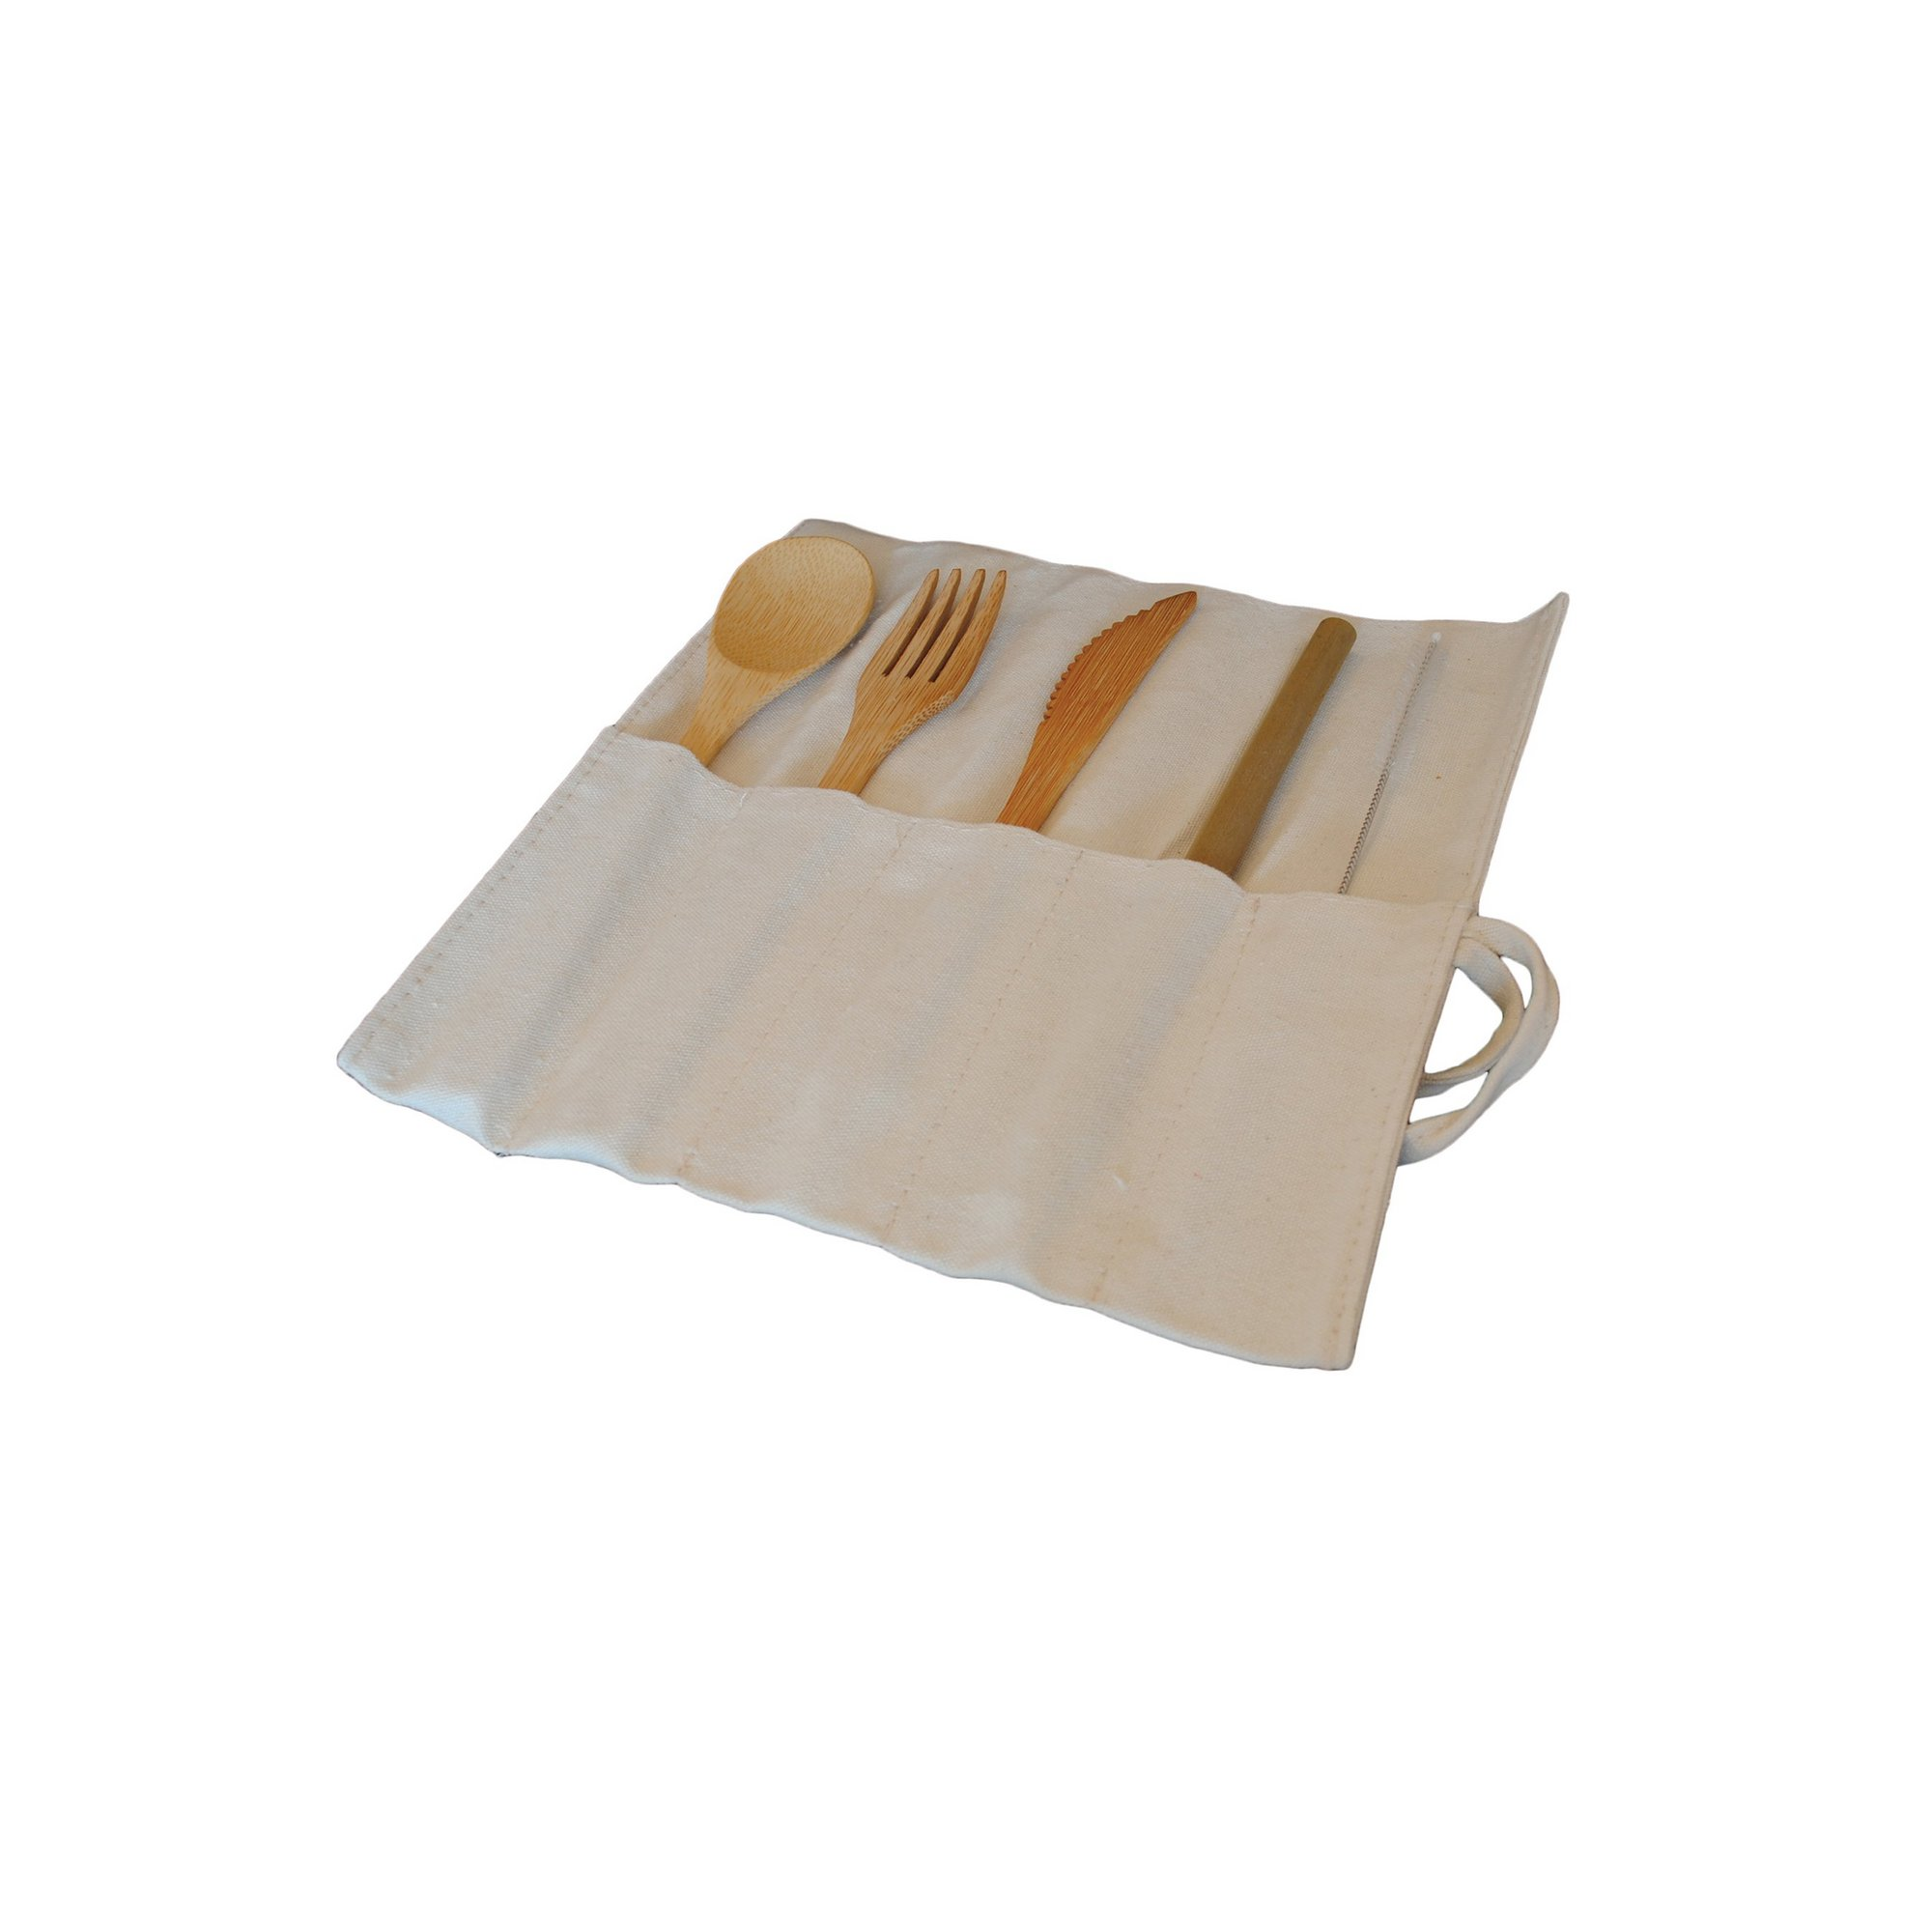 Image of Reusable Bamboo Cutlery Set